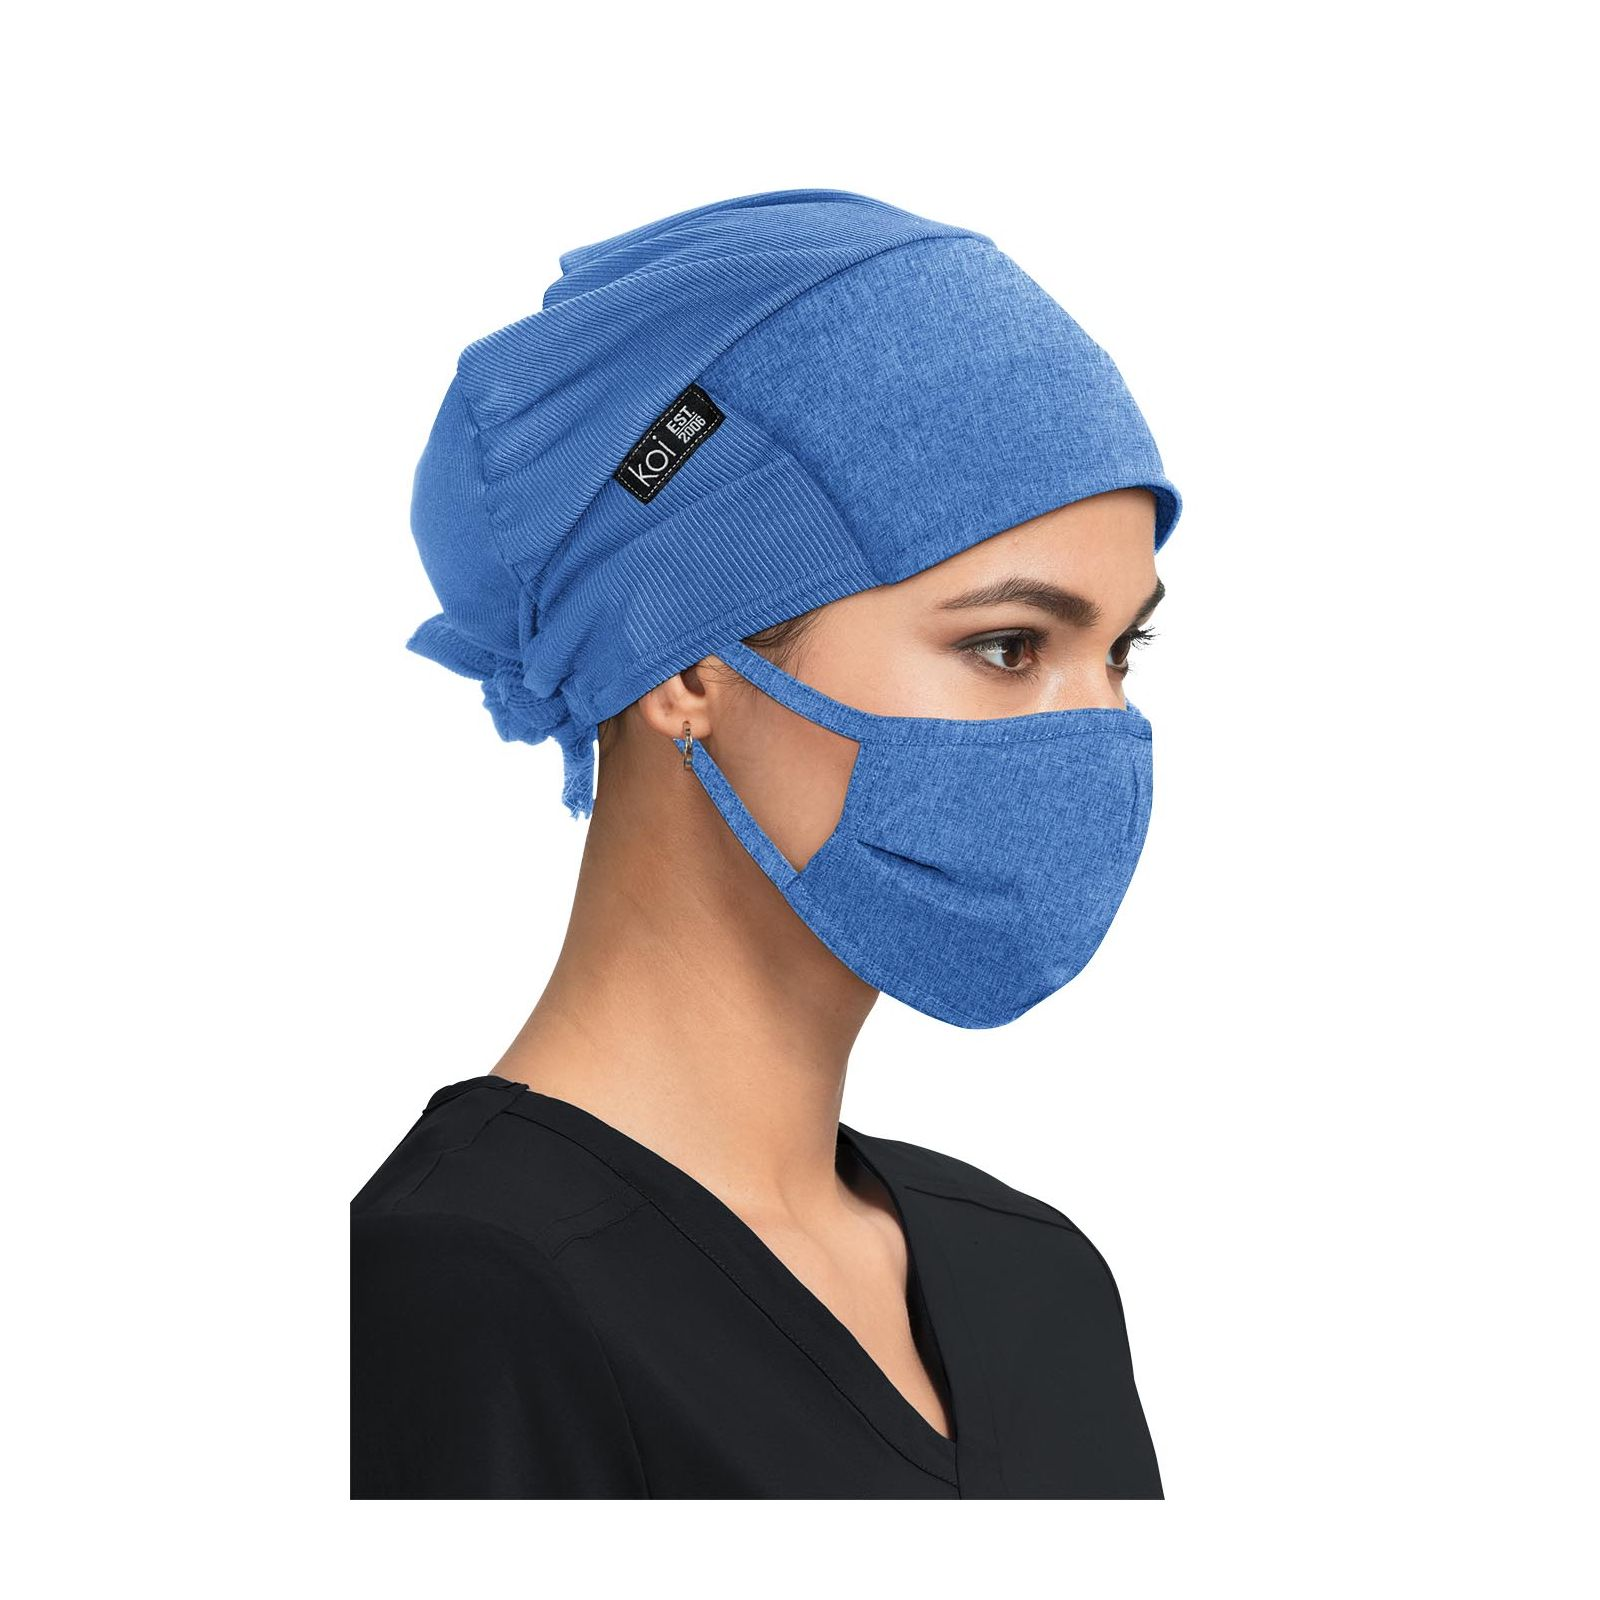 Calot Unisexe Koi Bleu Chiné (A161) vue femme